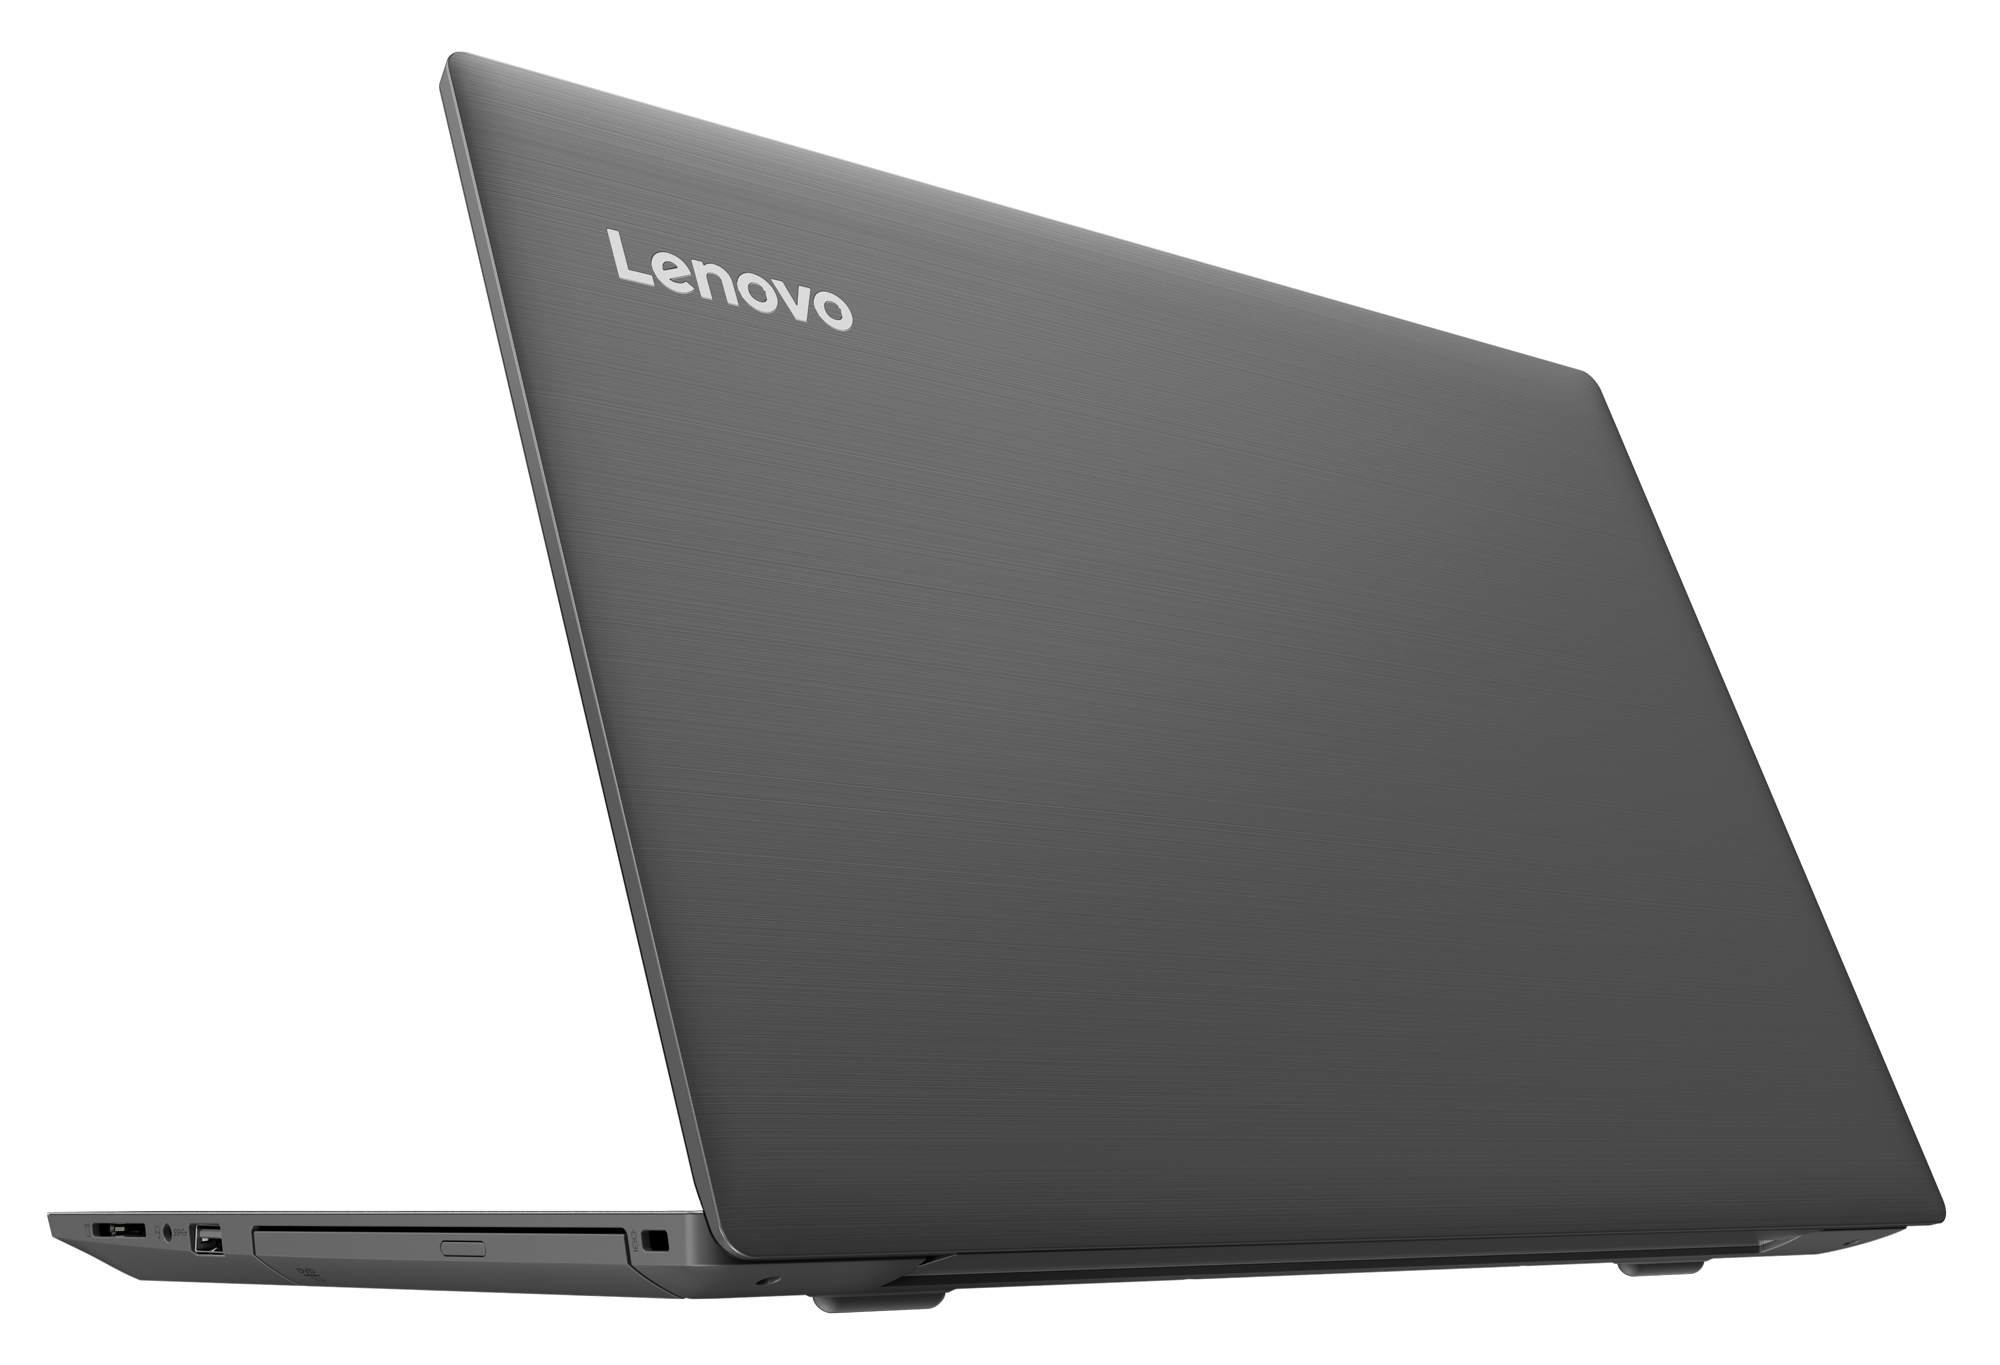 Фото  Ноутбук Lenovo V330-15IKB Iron Grey (81AX00QBRA)